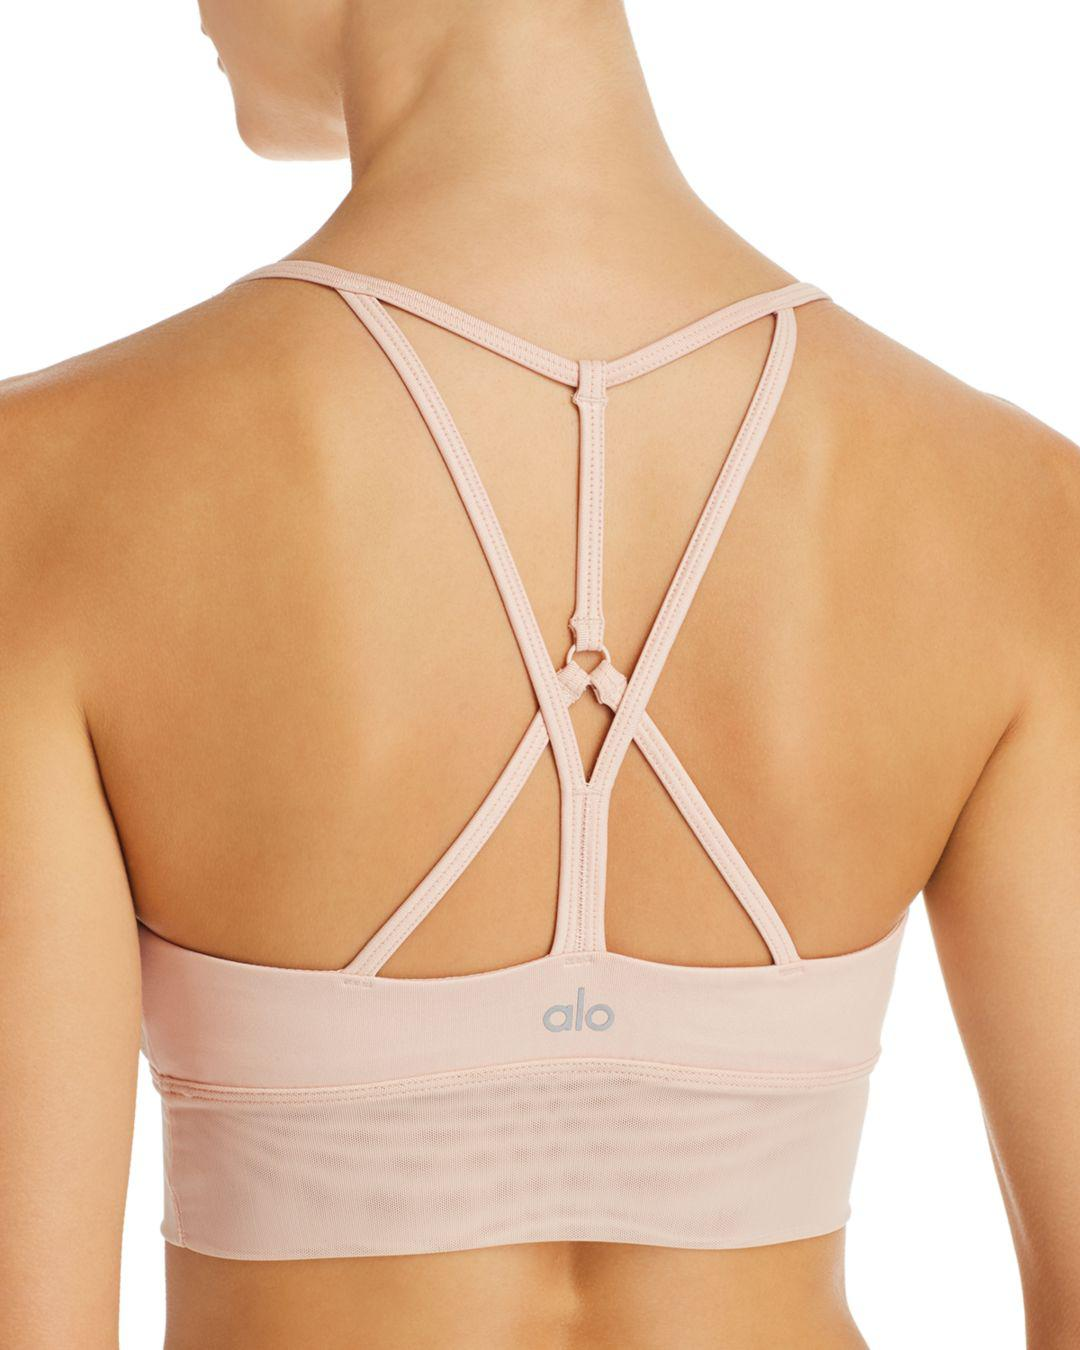 393d5292923b8 Lyst - Alo Yoga Lush Longline Bralette in Natural